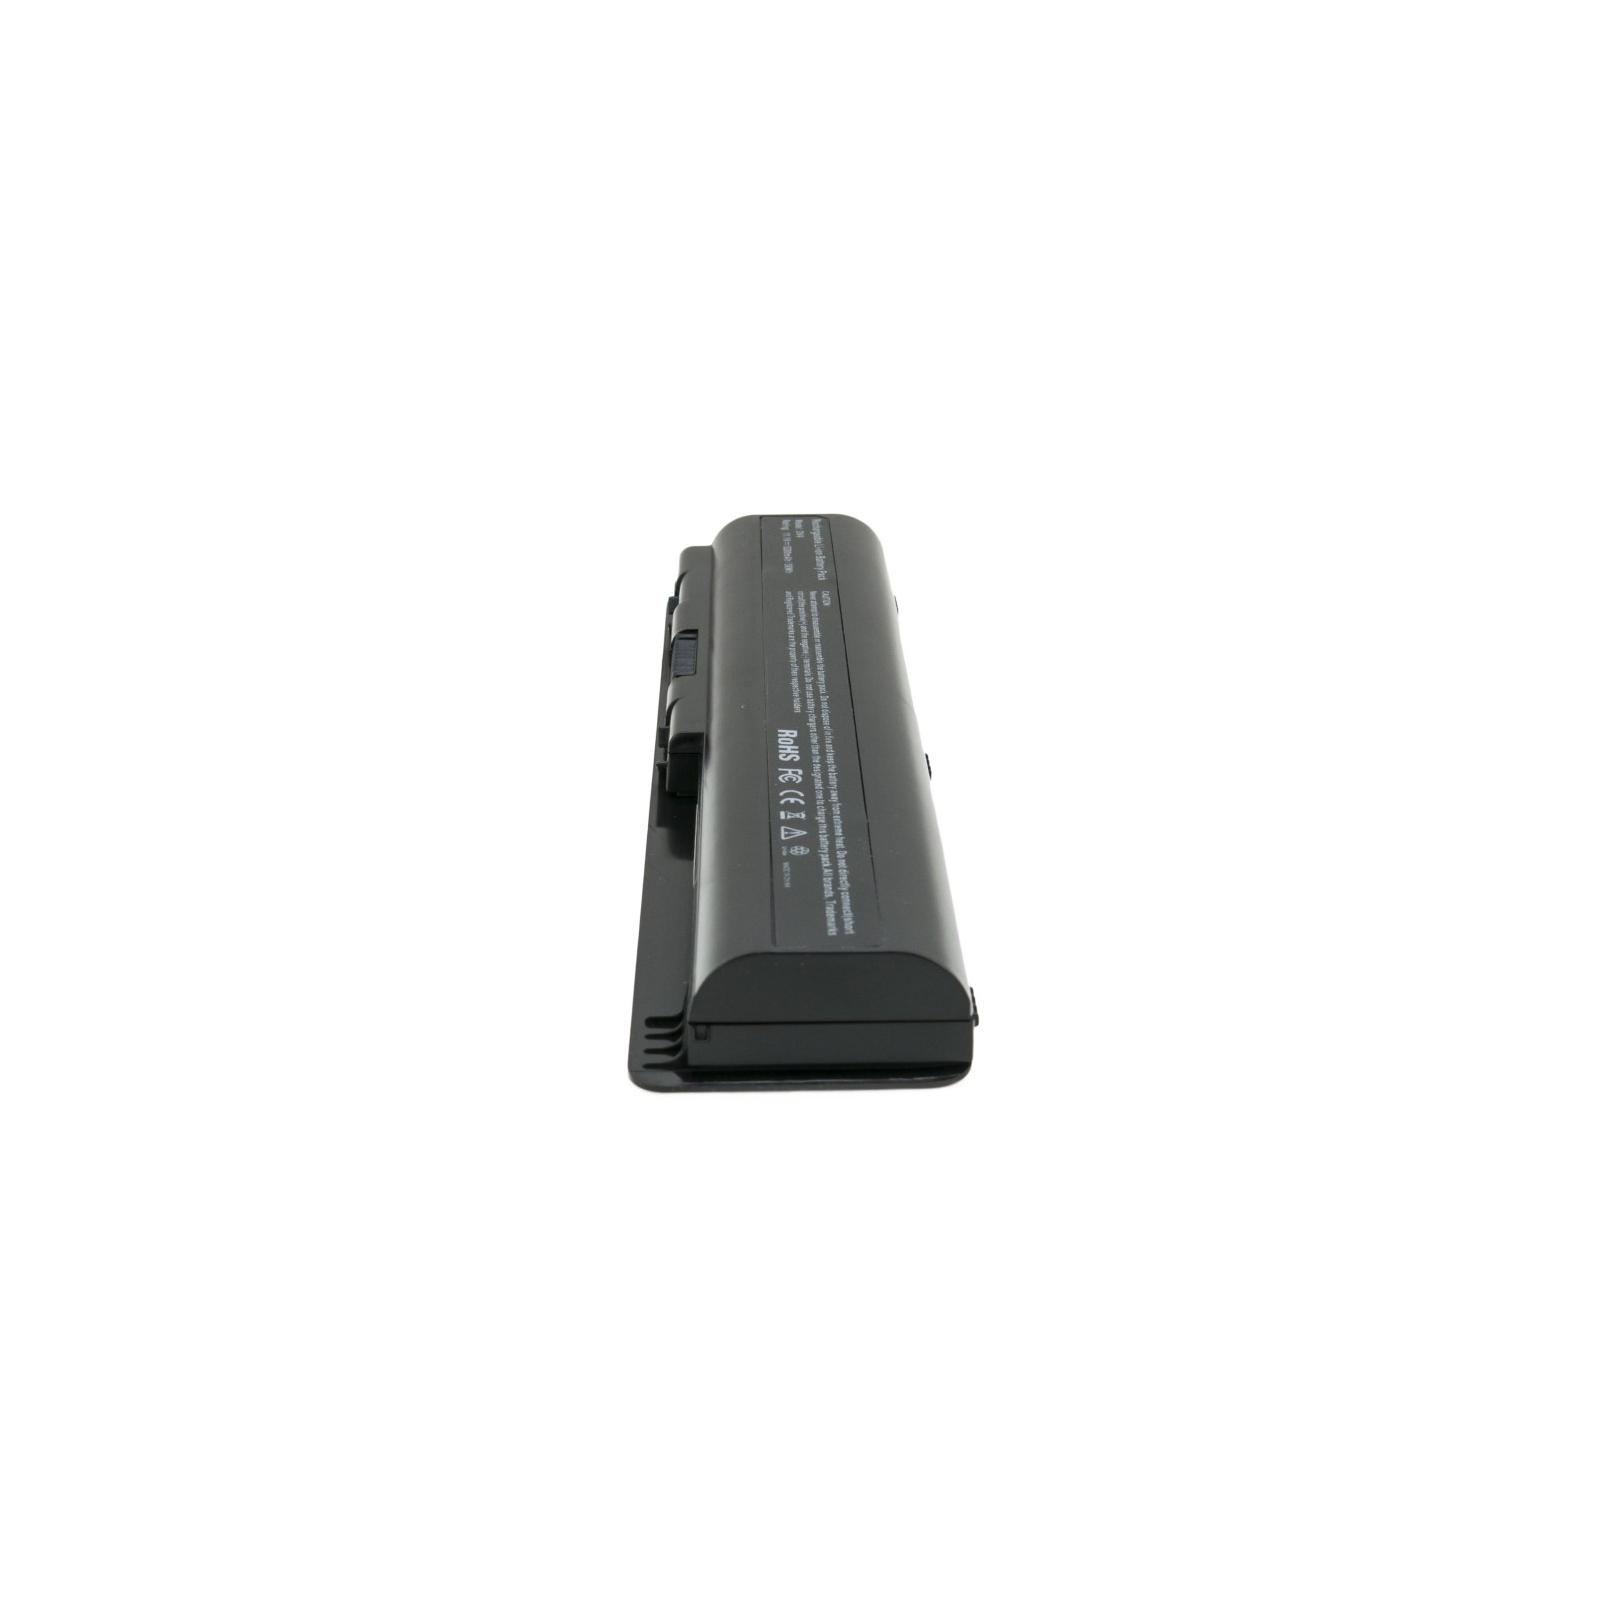 Аккумулятор для ноутбука HP Pavilion DV4 (HSTNN-DB72) 5200 mAh EXTRADIGITAL (BNH3946) изображение 5